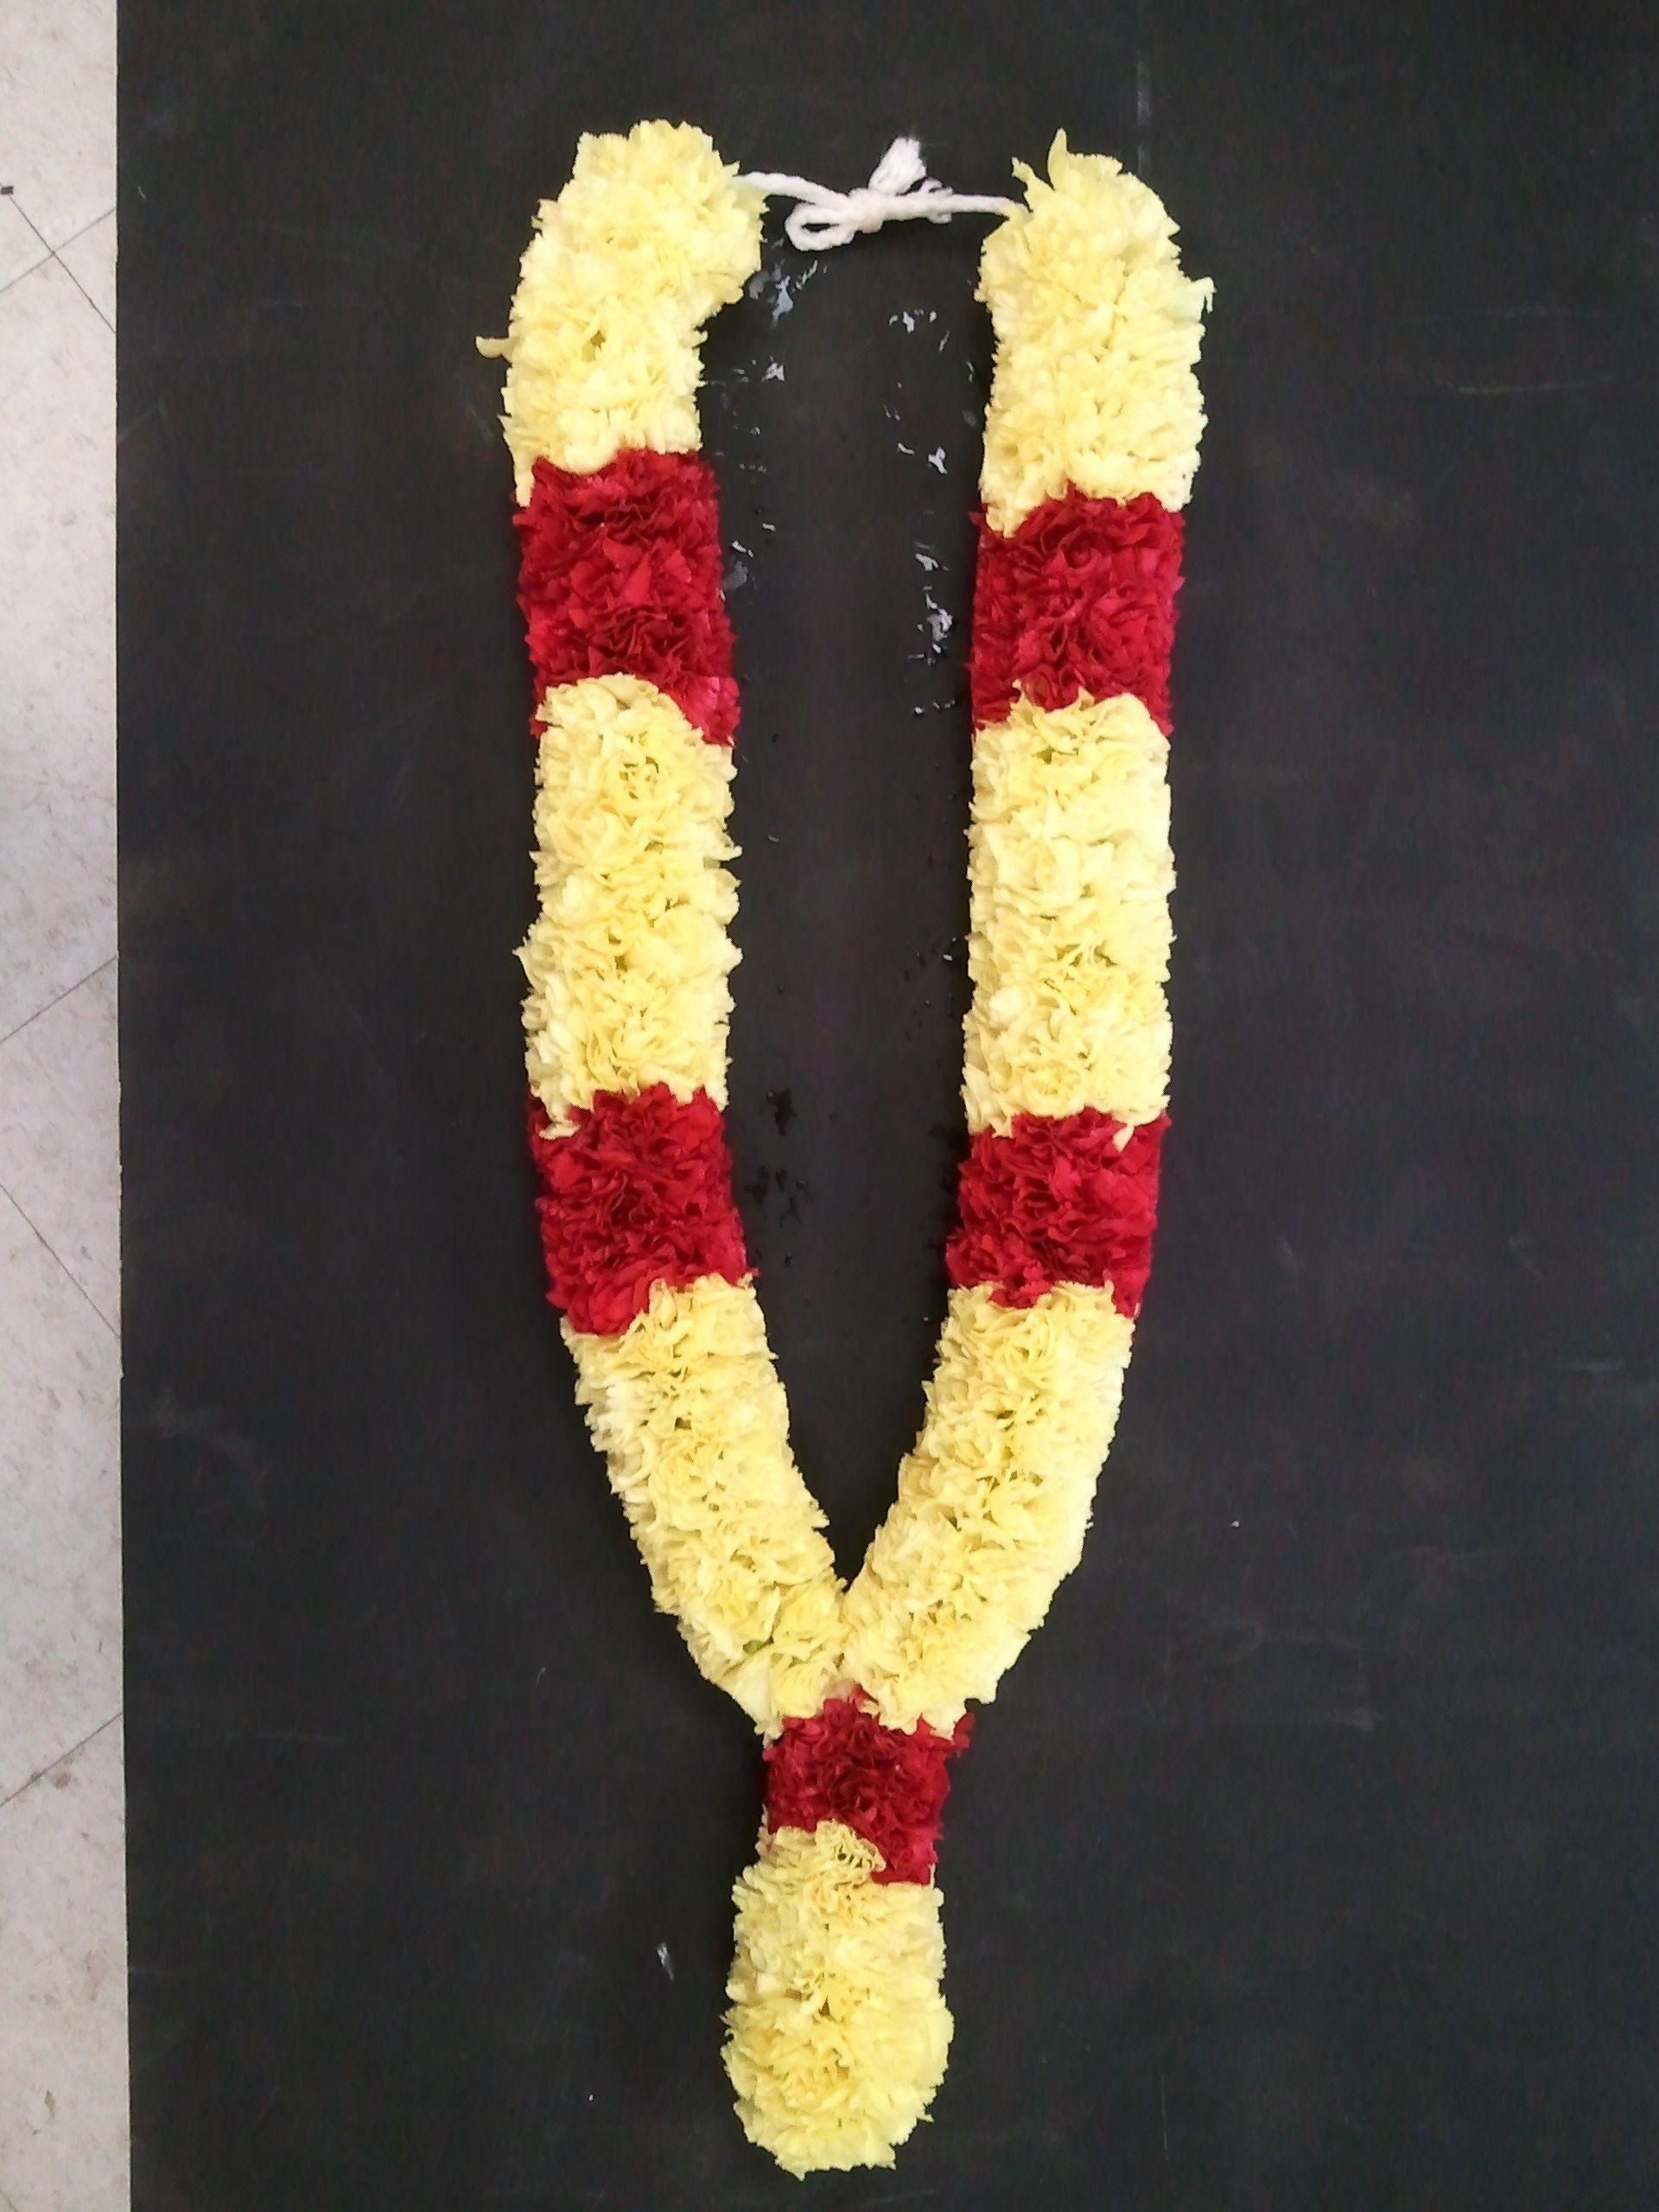 Itflowers Com Cg1 Png Jpg 1920 2560 Flower Garland Wedding Indian Wedding Garland South Indian Wedding